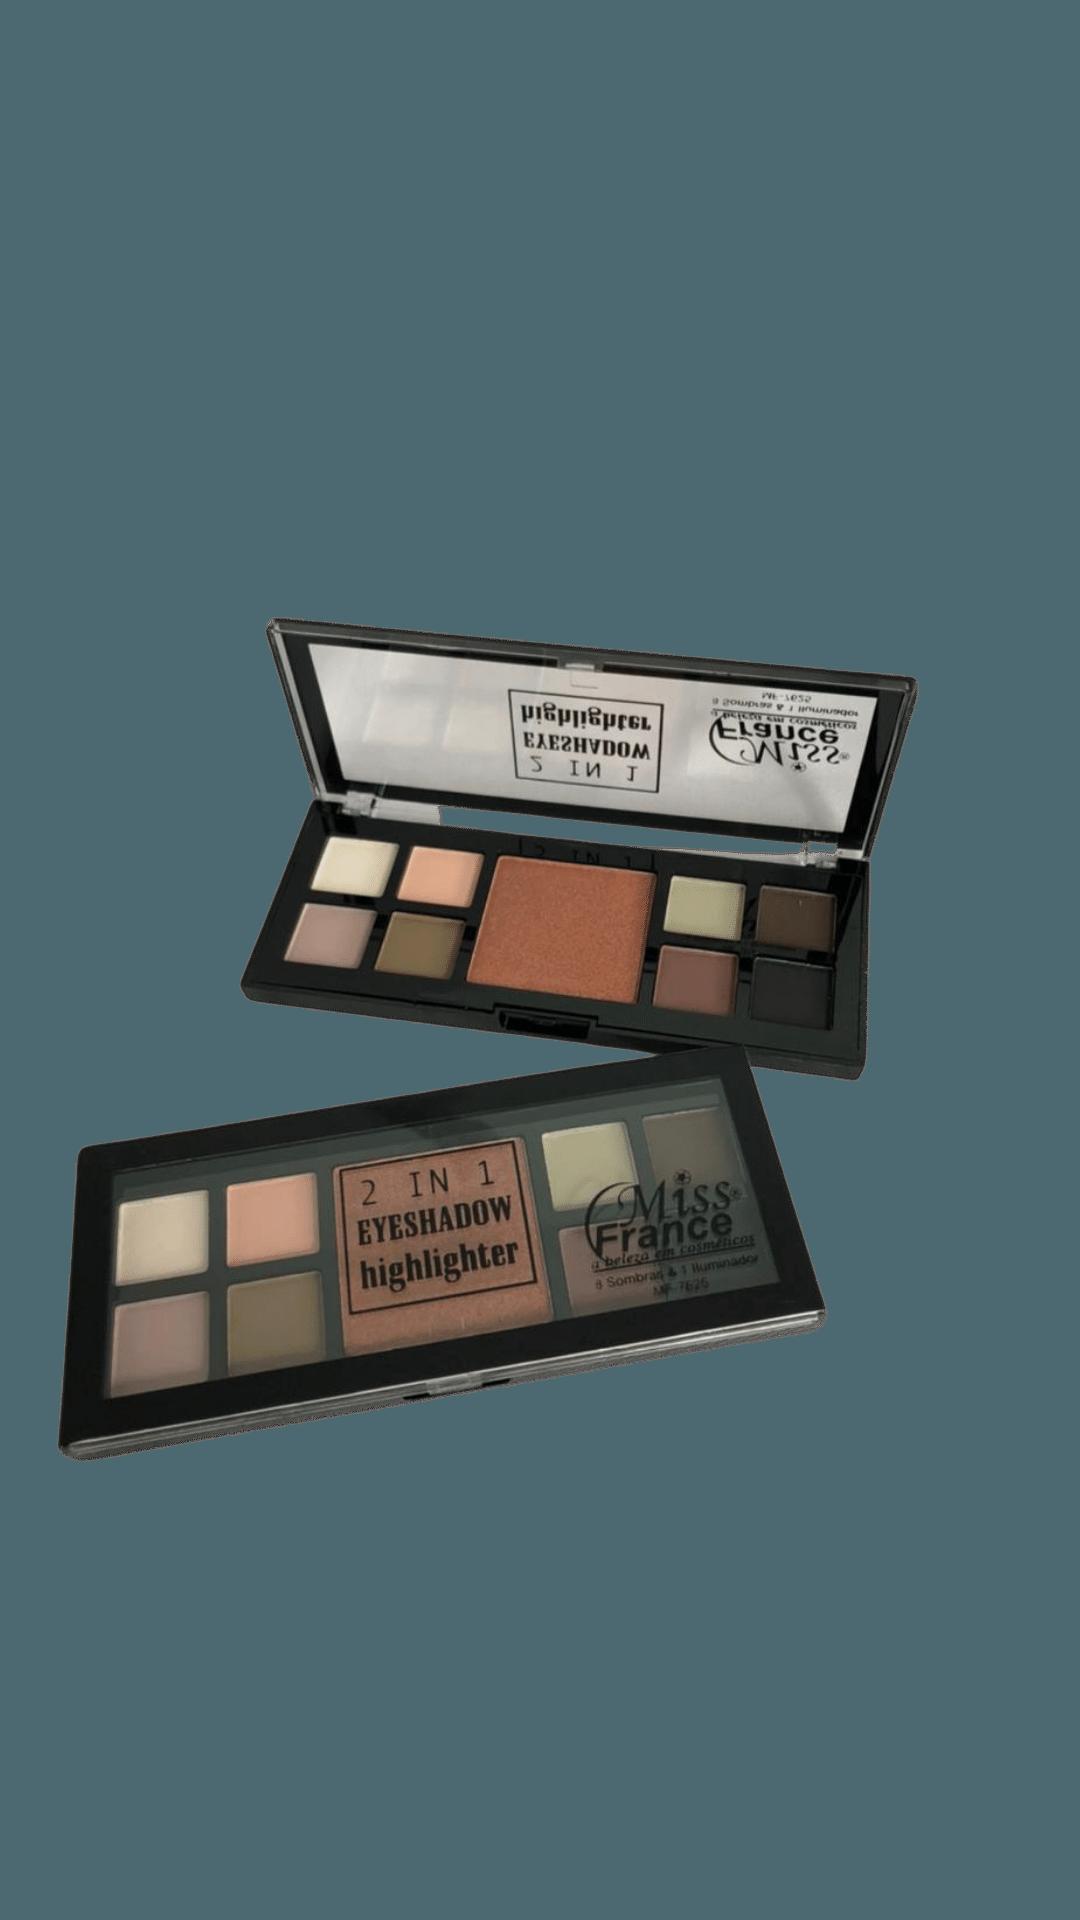 Paleta de Sombras 2 IN 1 Eyeshadow Highlighter C4 - Miss France (MF7625D)